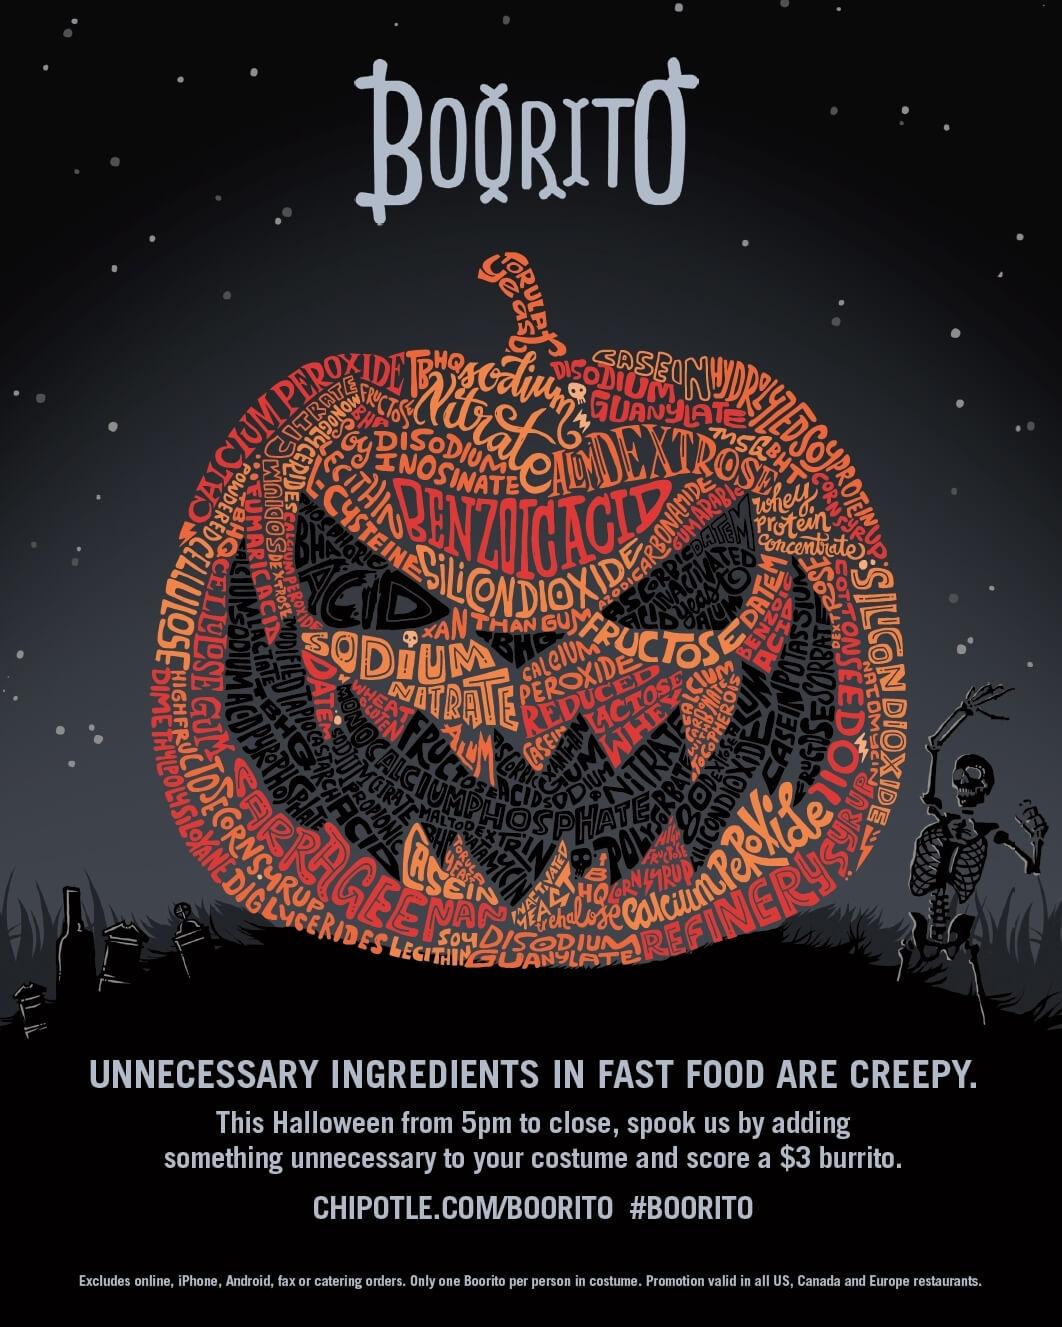 Chipotle Boorito Halloween